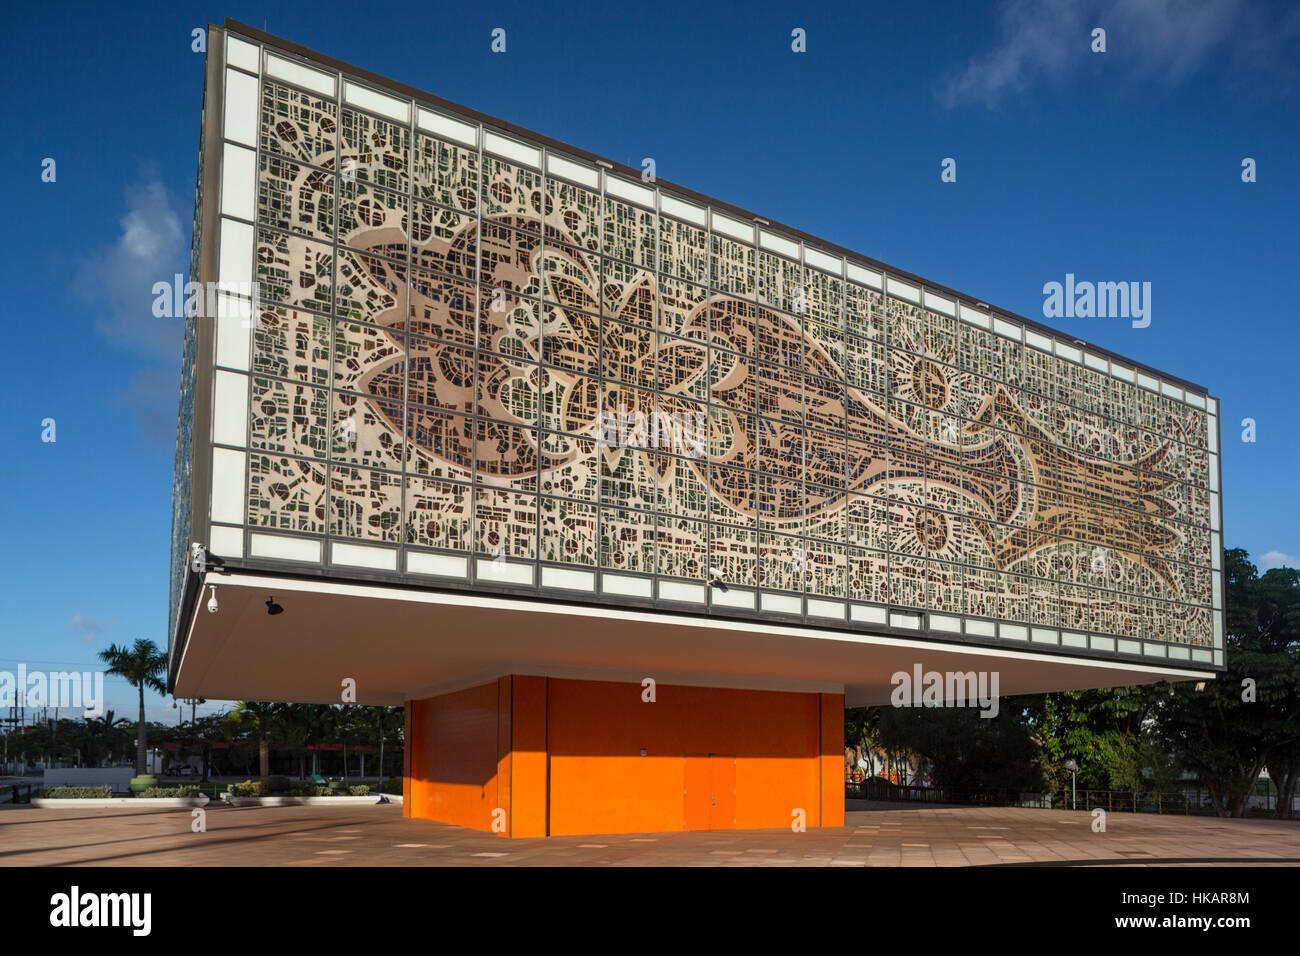 JEWEL BOX ANNEX (©IGNACIO CARRERA JUSTIZ 1973) NATIONAL YOUNGARTS CAMPUS MIAMI FLORIDA USA - Stock Image